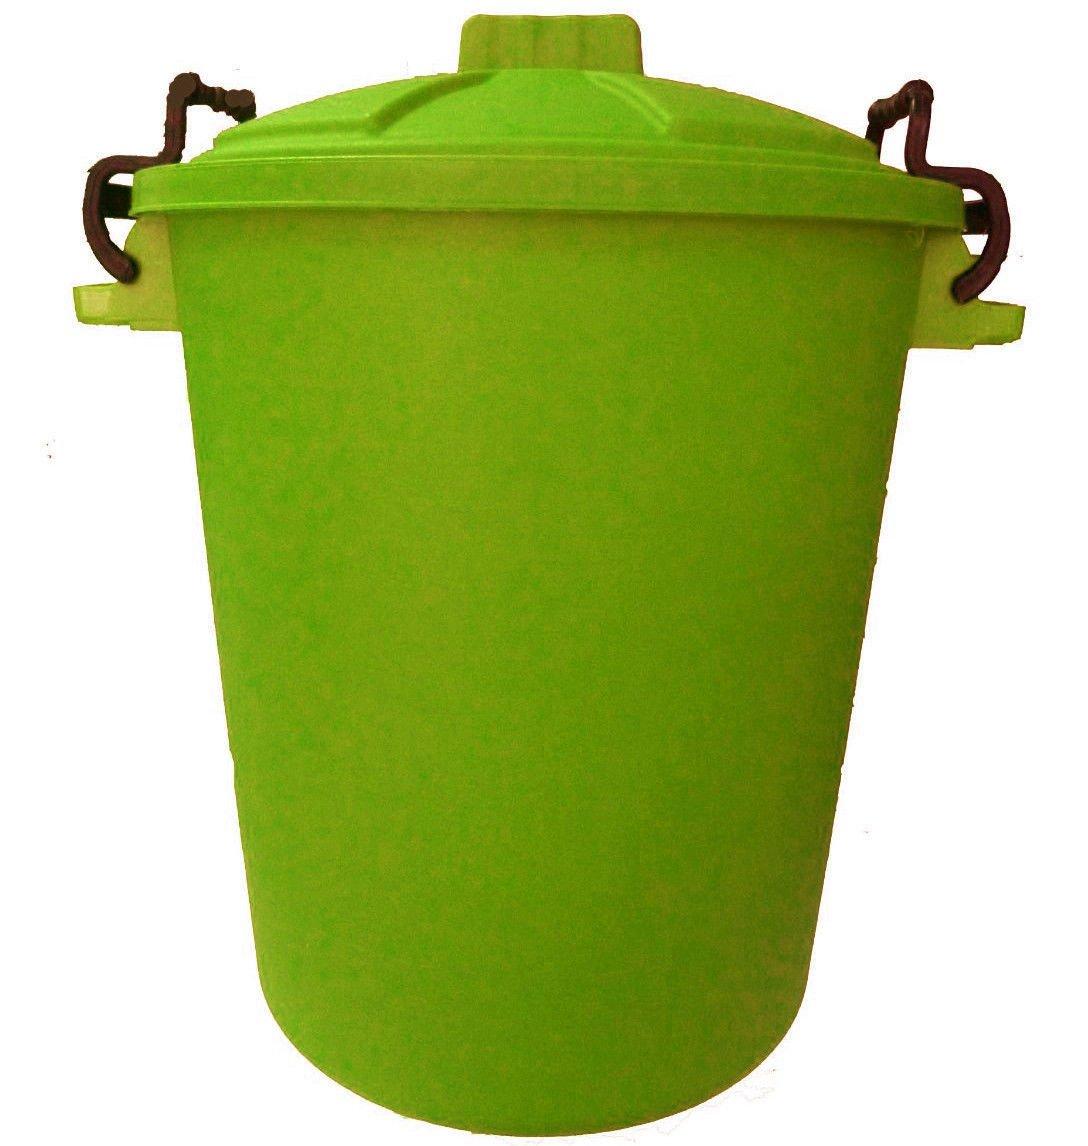 50L - Lime Green - Litre Plastic Colour Bin Garden Rubbish Waste Dustbin OnlineDiscountStore